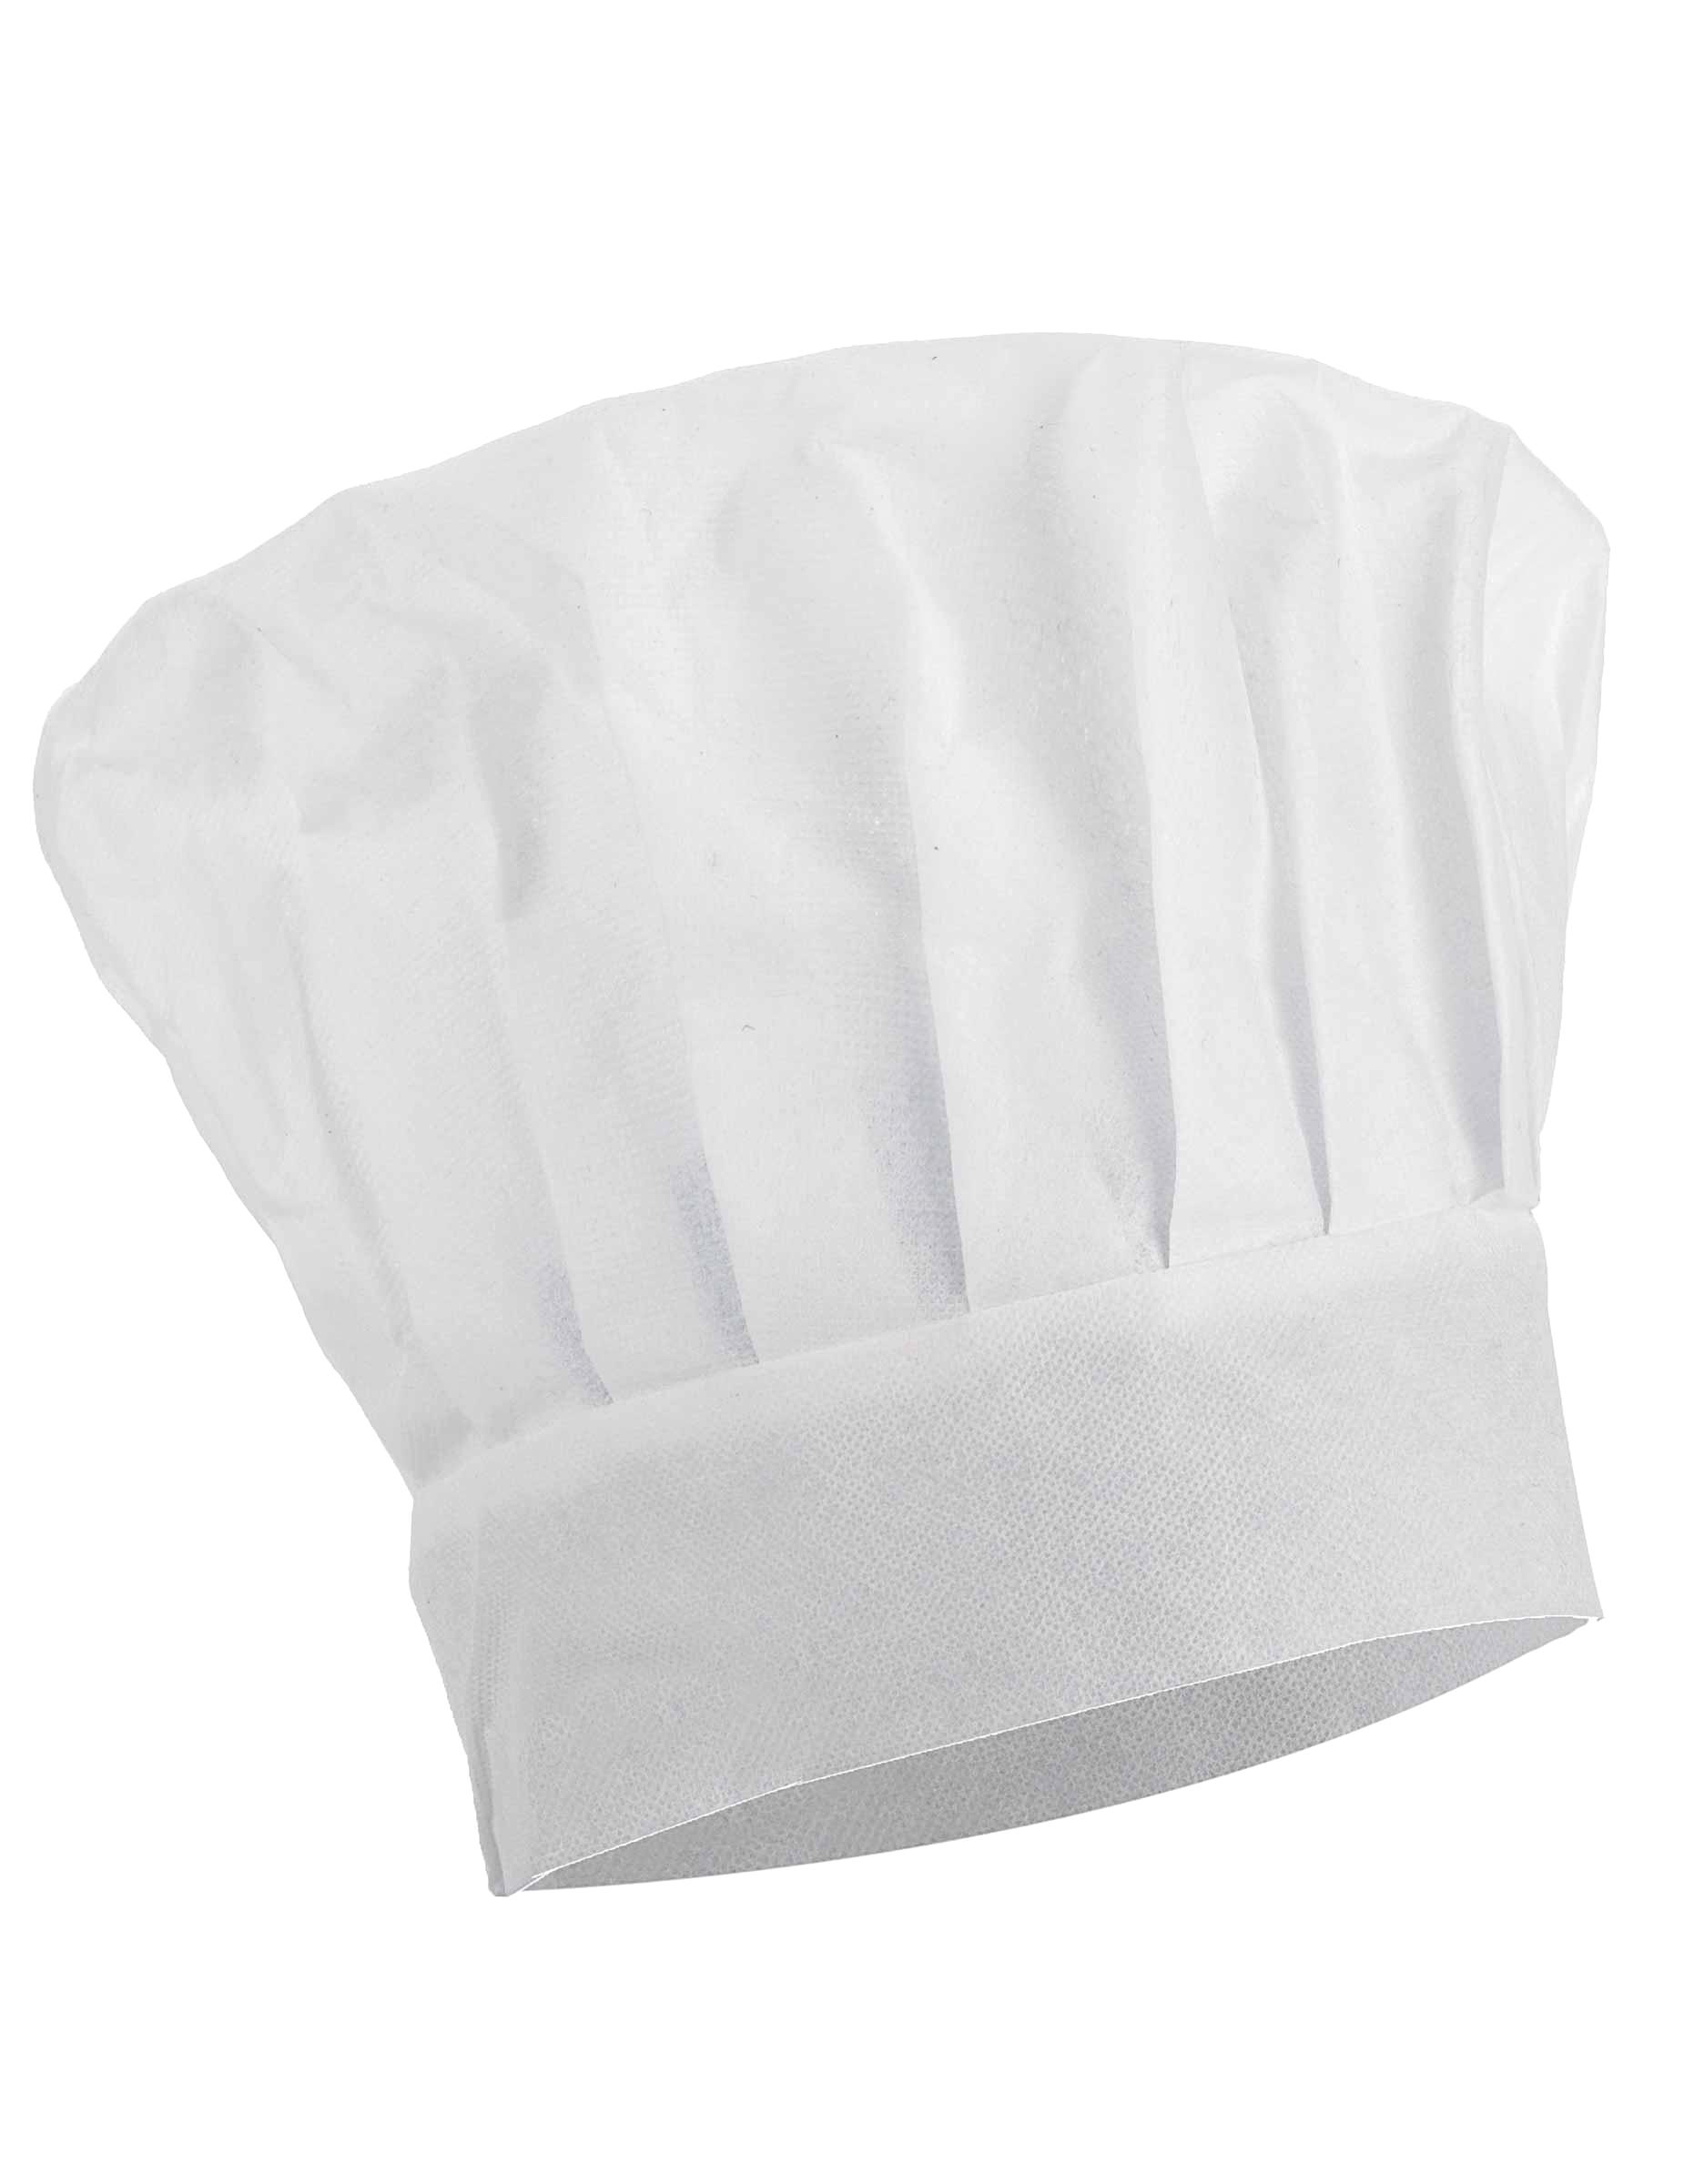 Kochm tze h te und g nstige faschingskost me vegaoo for Elementos de cocina para chef